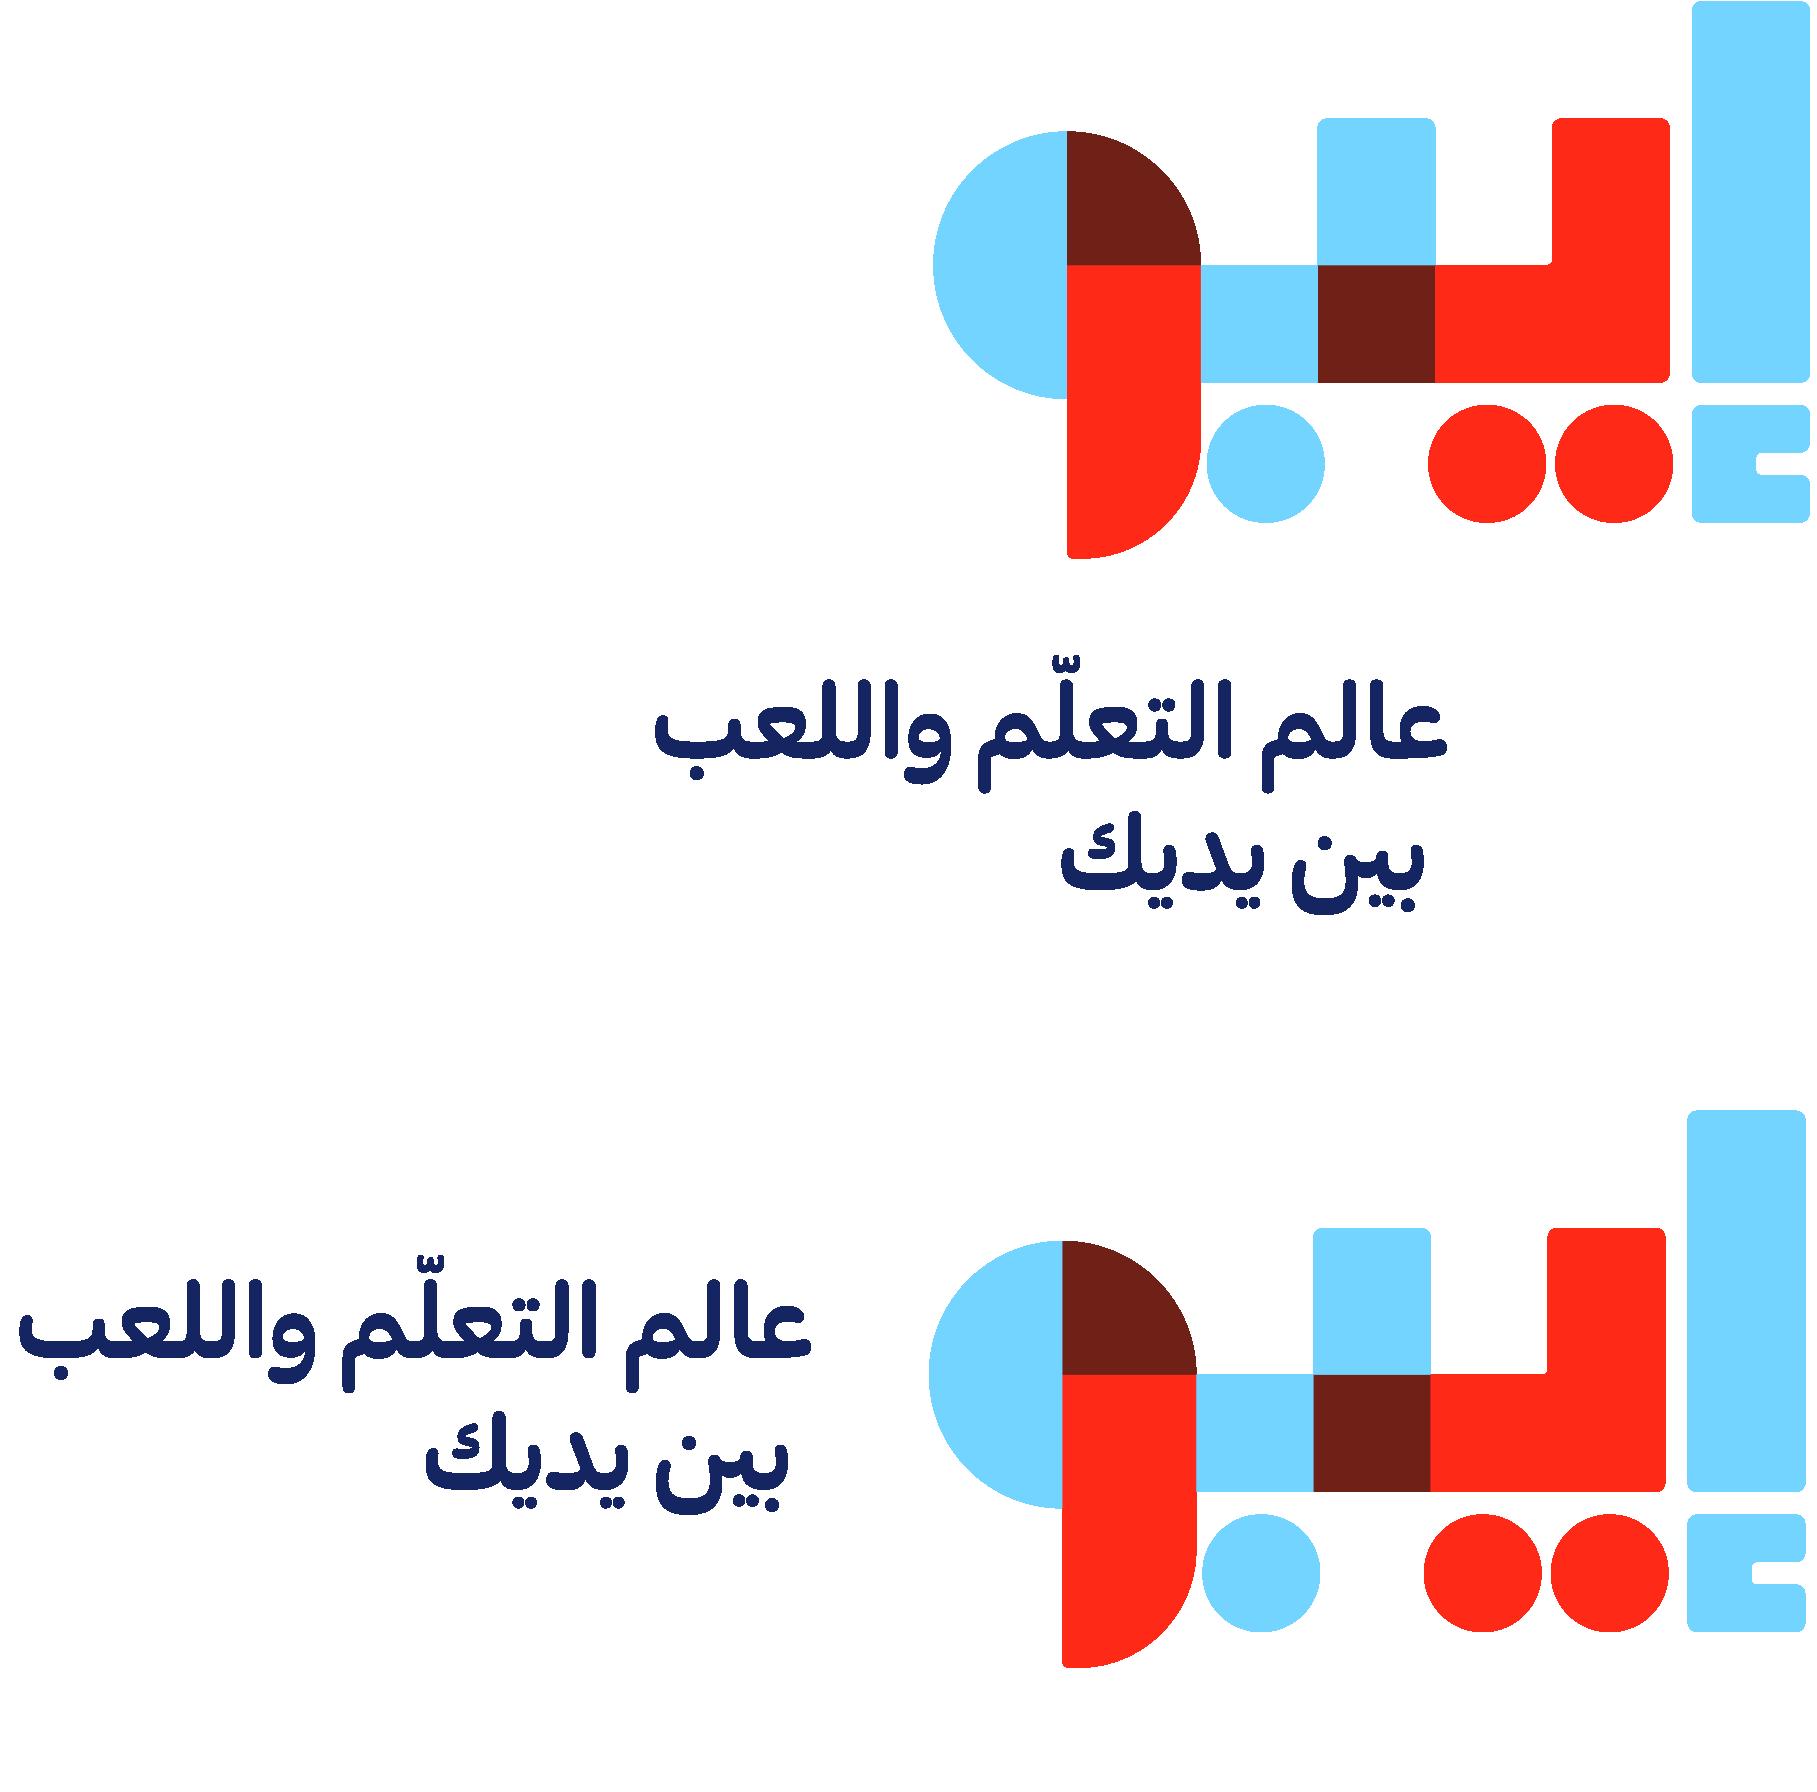 ebo_arabic_taglines